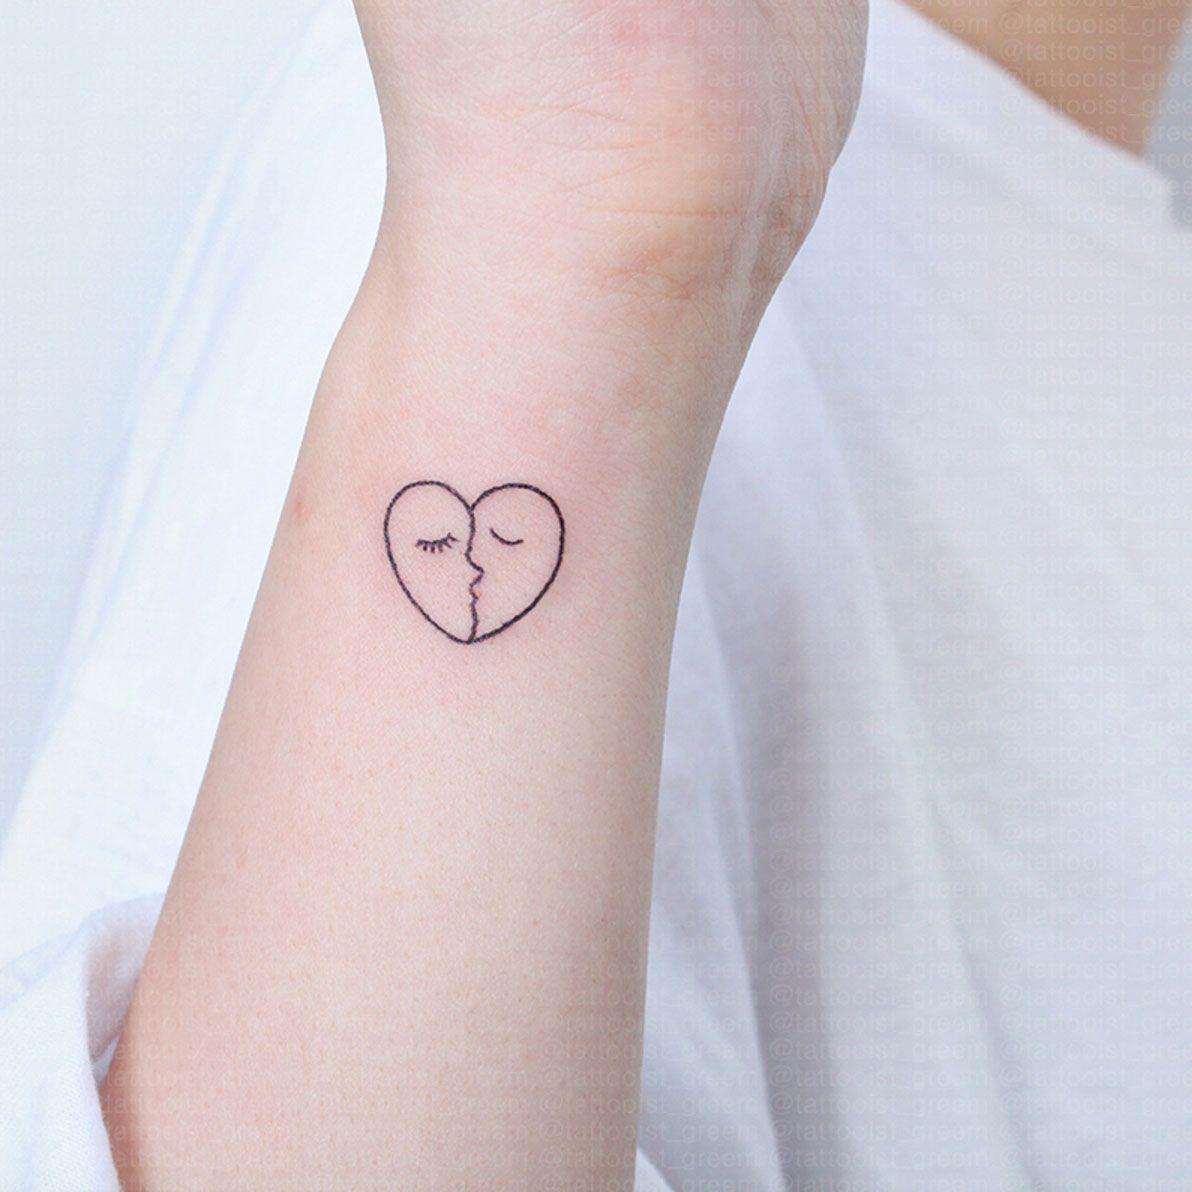 65 small tattoos for women tiny tattoo design ideas buycottarizona Choice Image